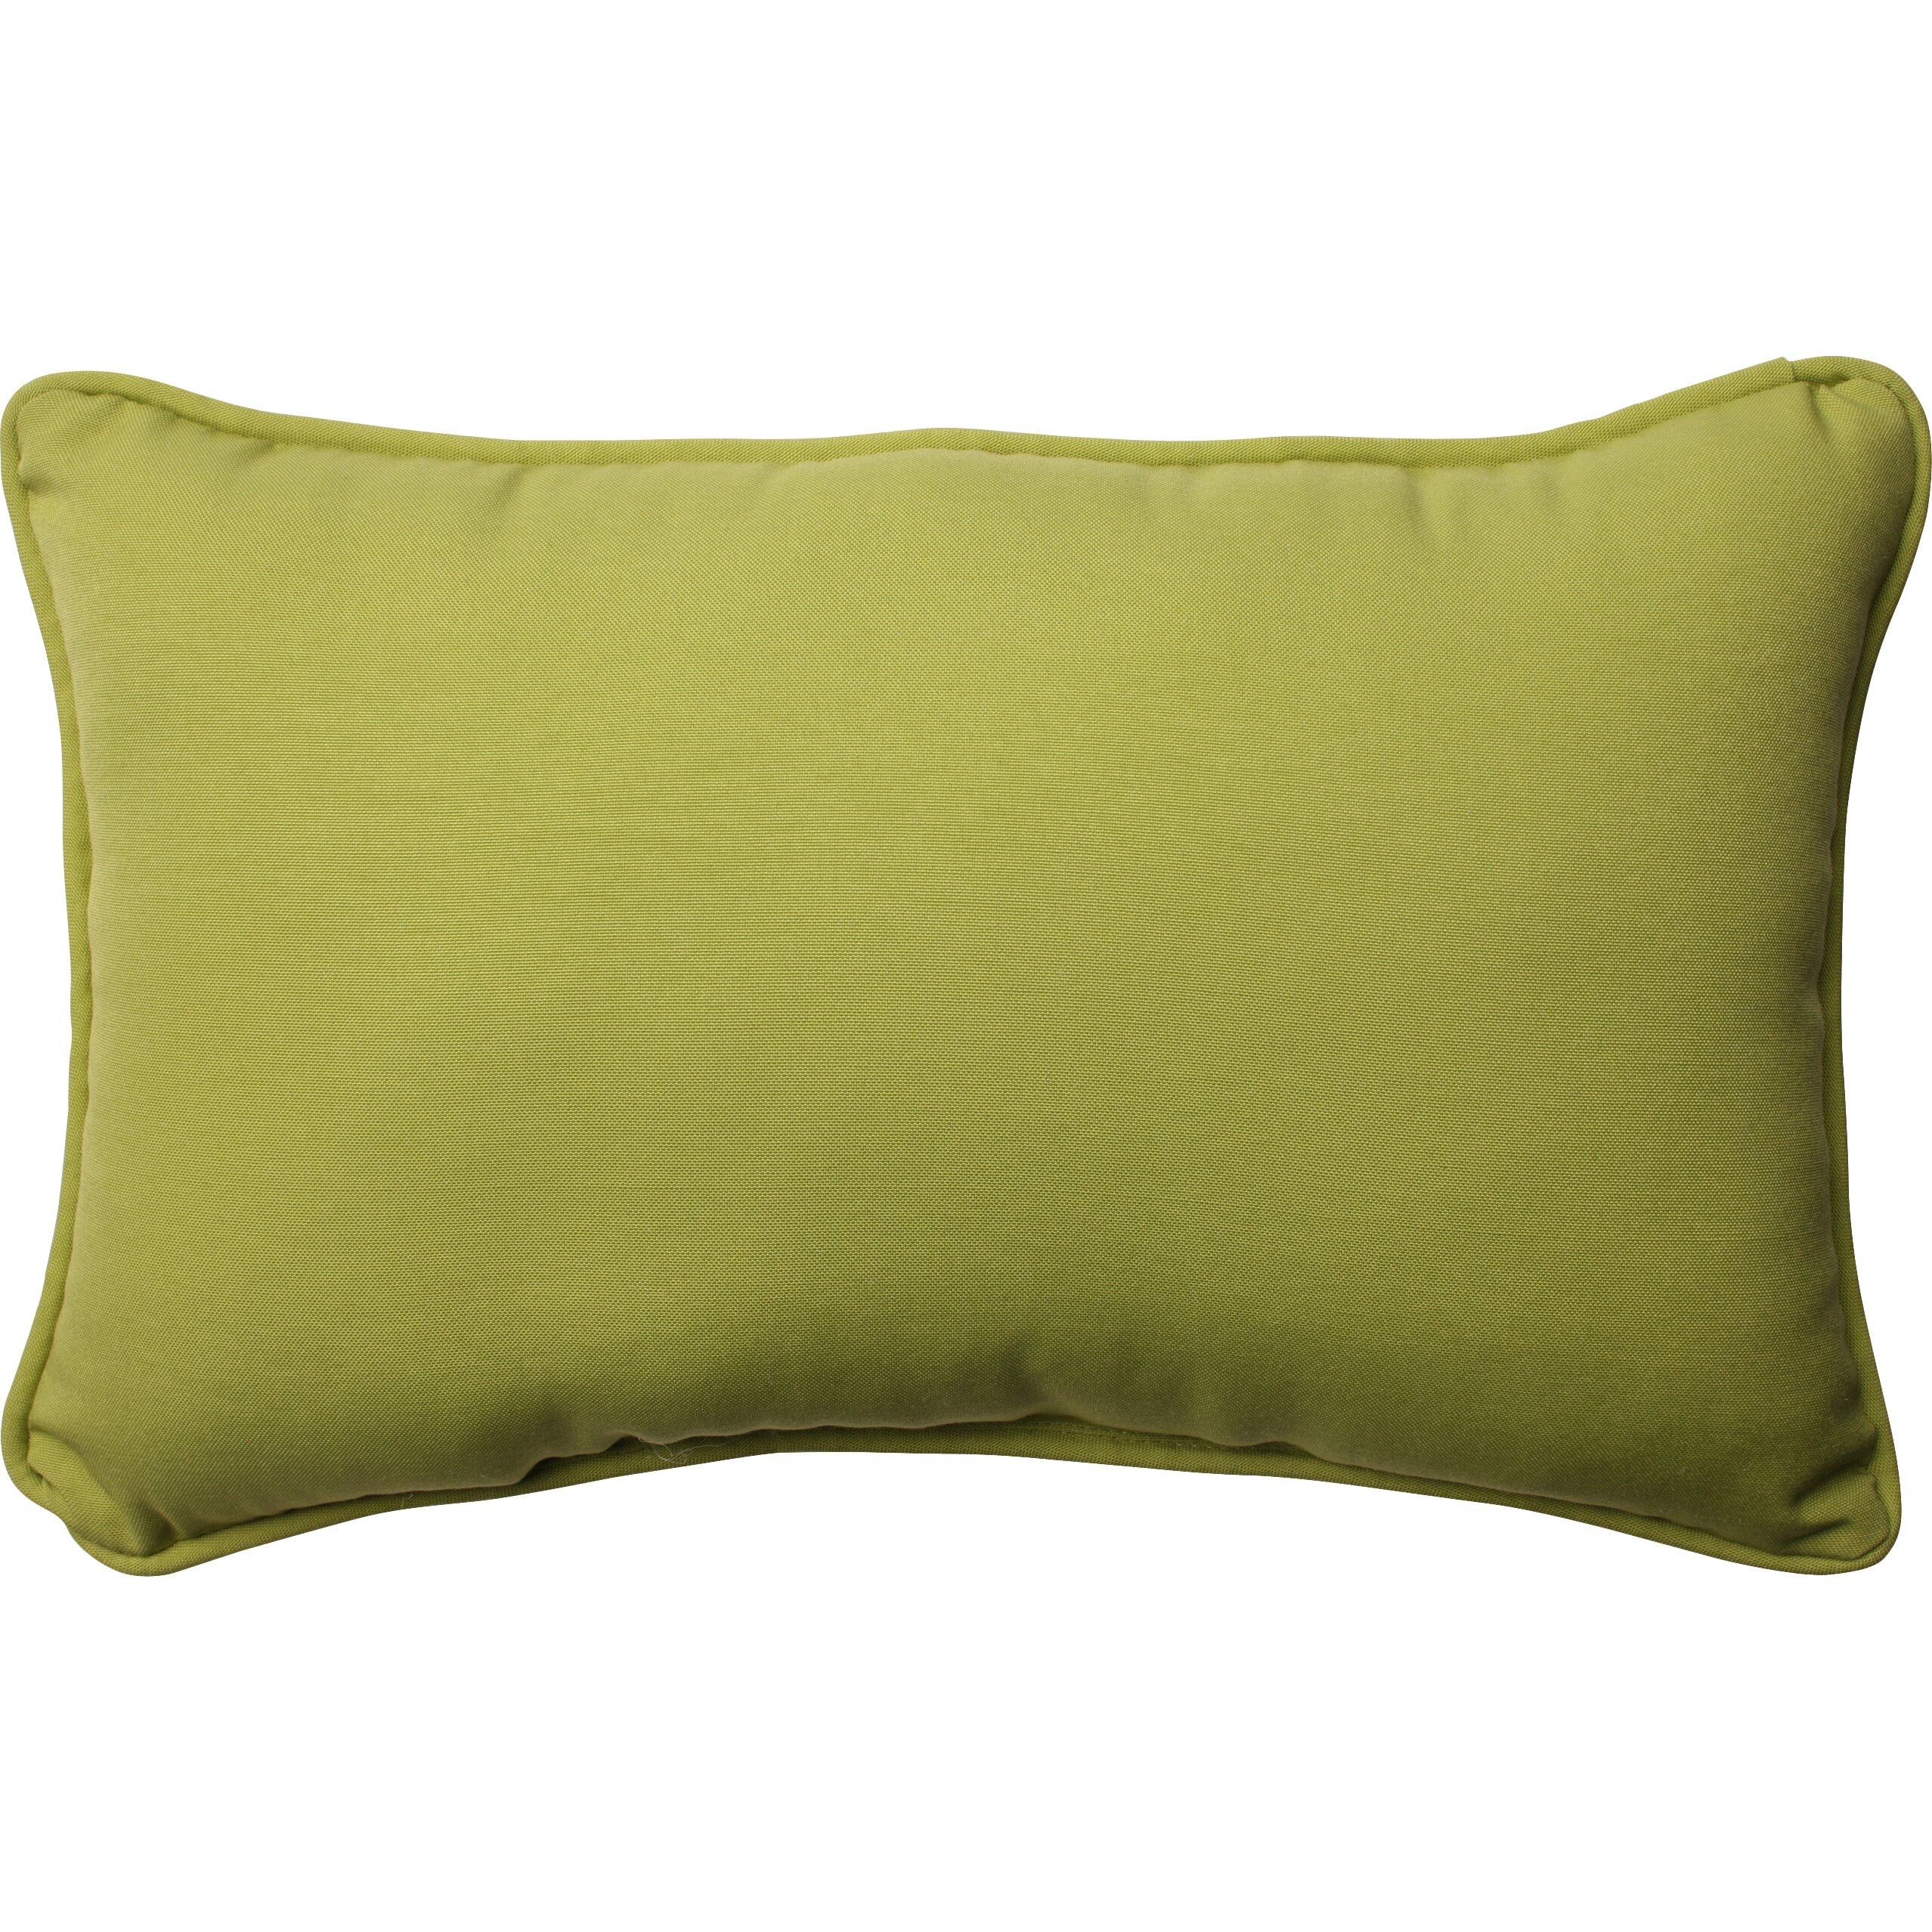 Wayfair Green Throw Pillows : Pillow Perfect Fresco Pear Indoor/Outdoor Throw Pillow & Reviews Wayfair